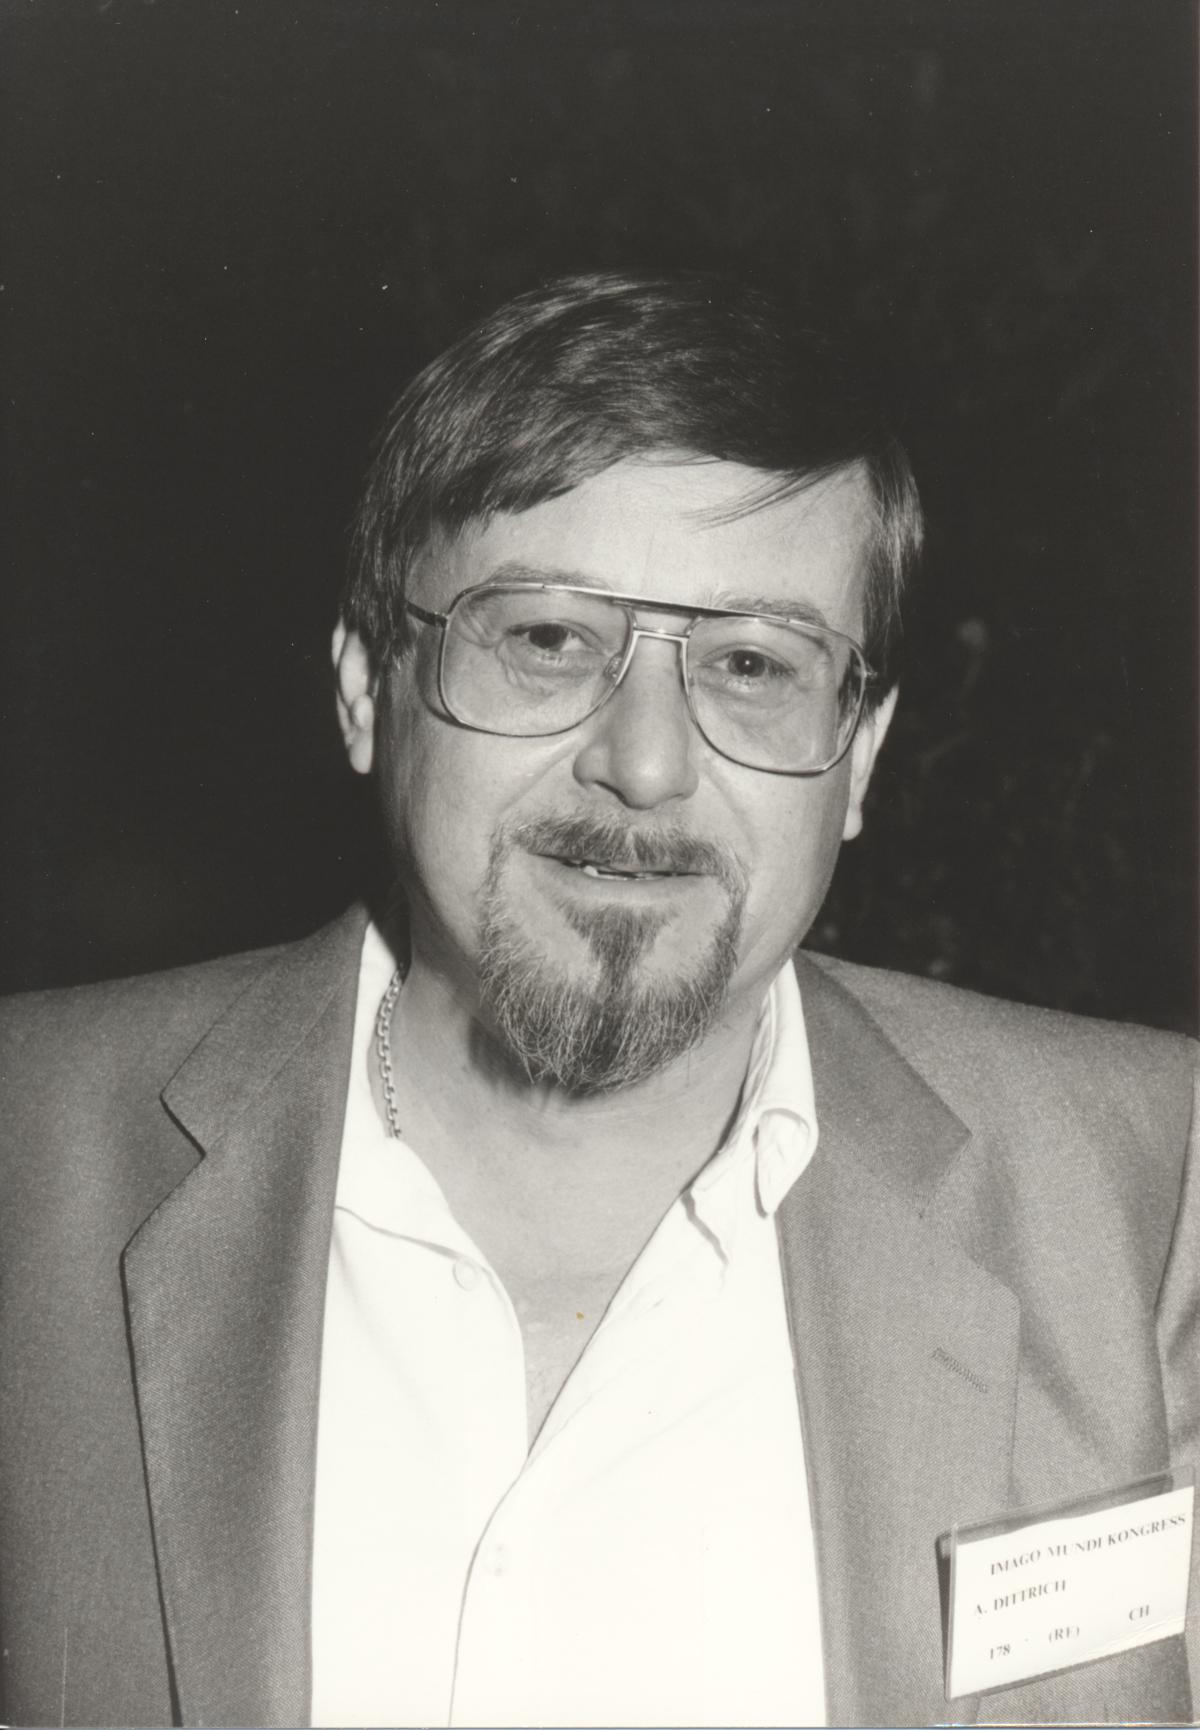 XII. Imago Mundi-Kongress 1989, Innsbruck, Doz. Dr. Adolf Dittrich